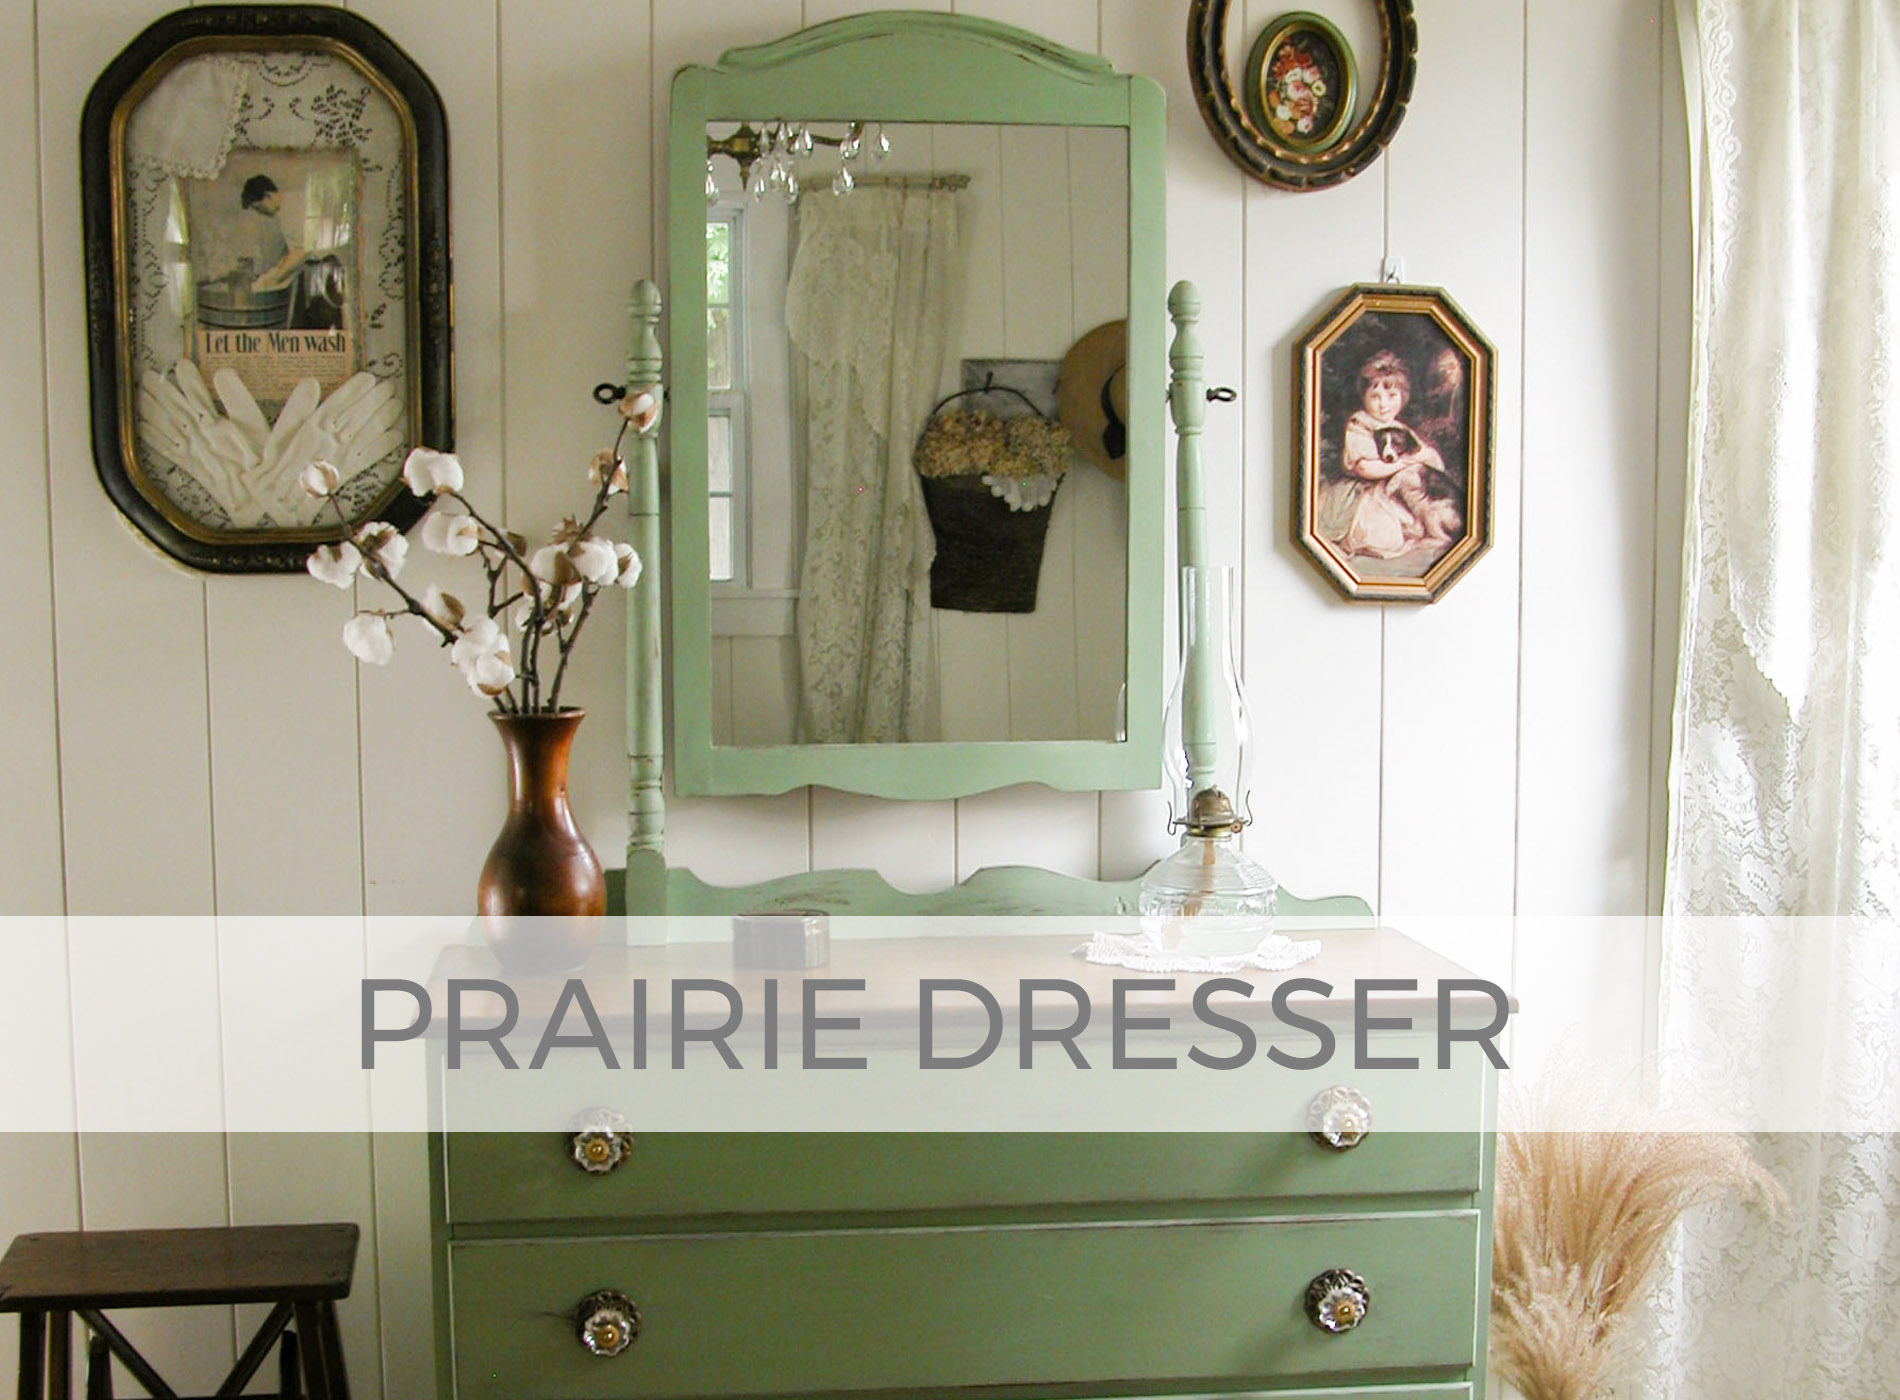 80's Dresser gets Prairie Charm by Larissa of Prodigal Pieces | prodigalpieces.com